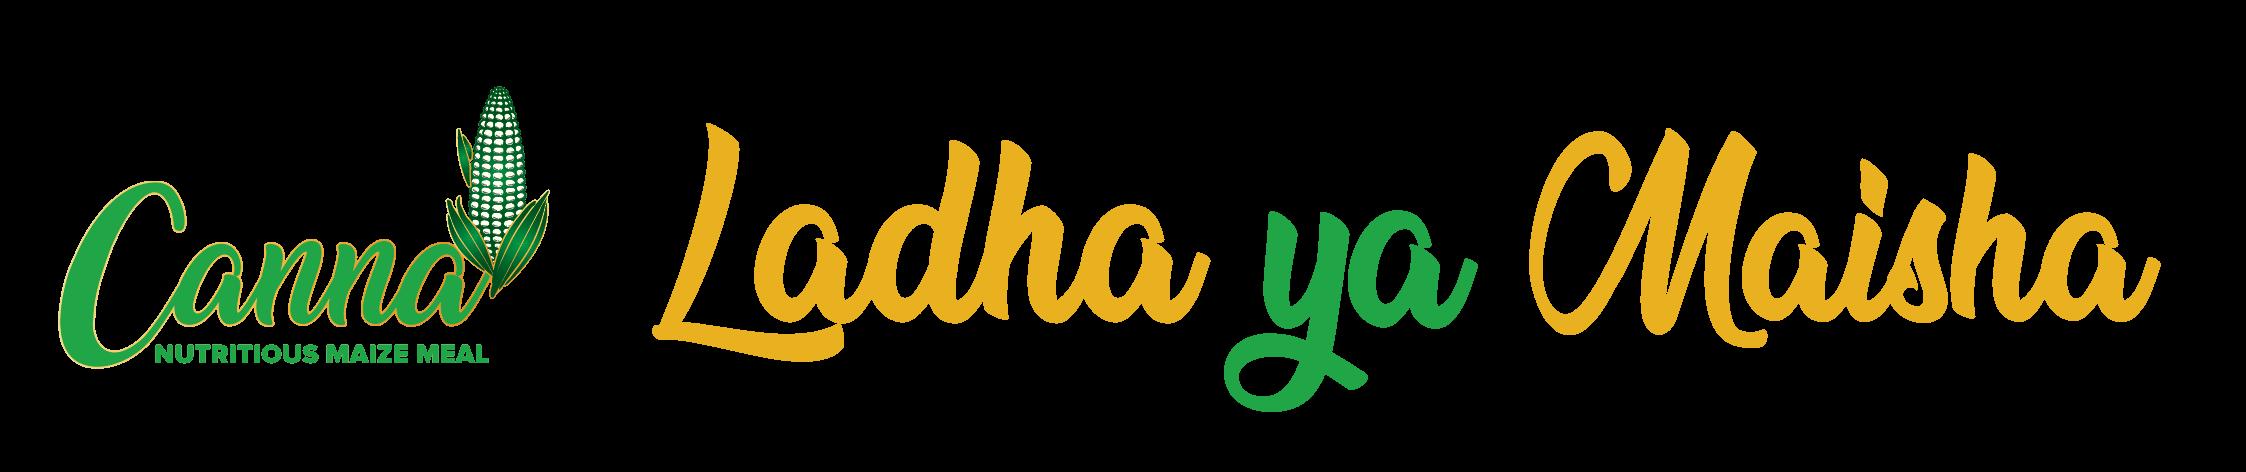 Canna slogan